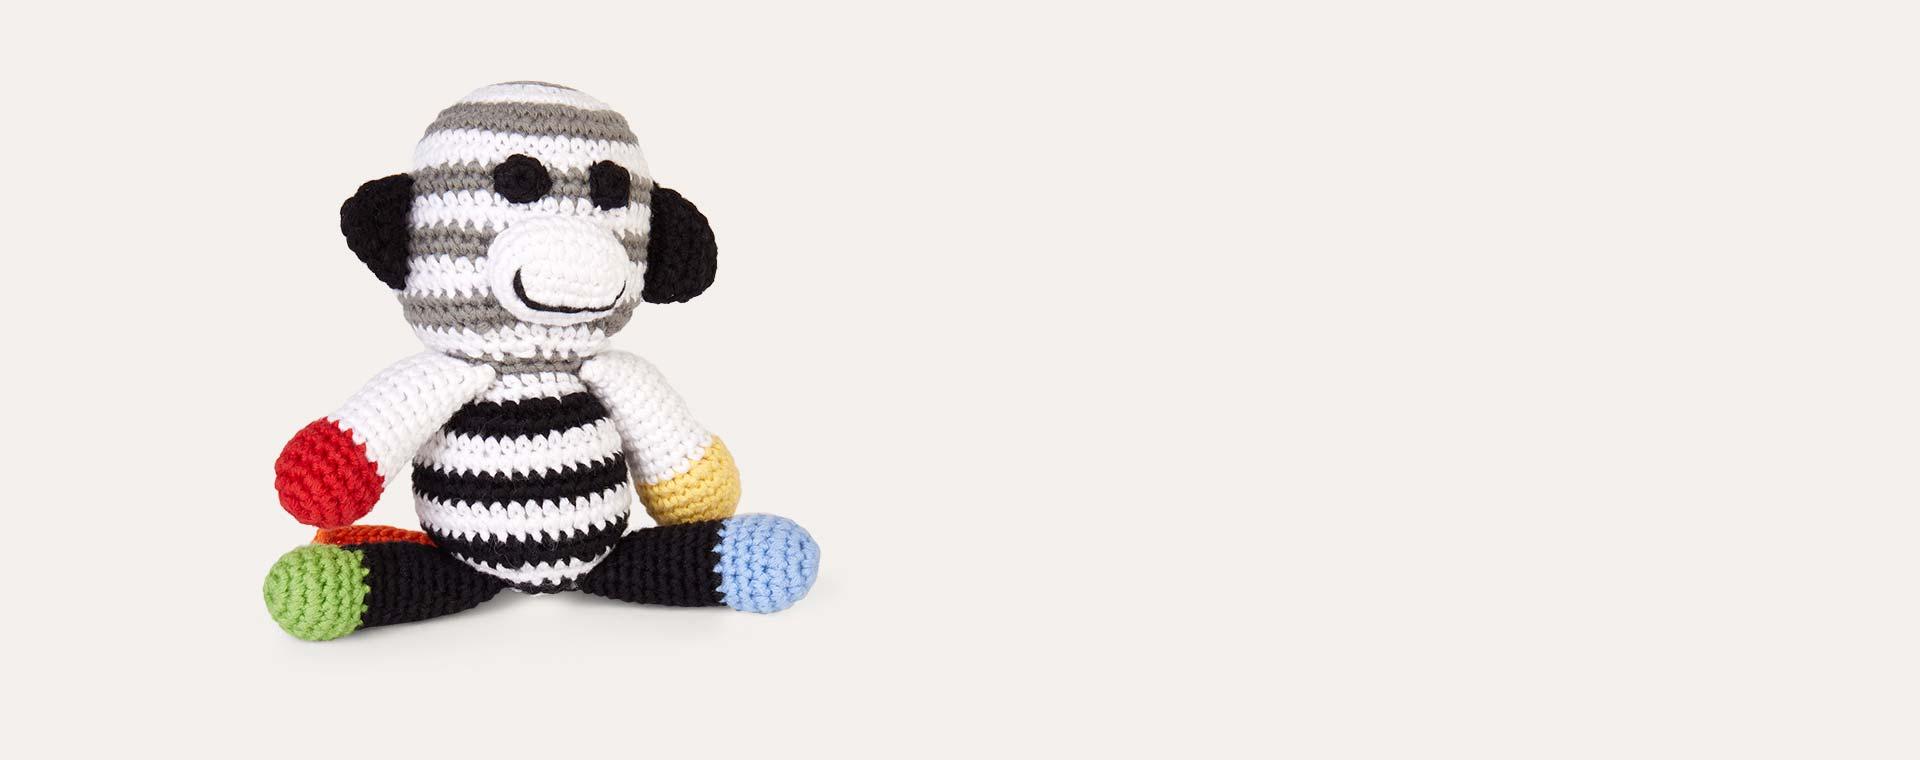 Black Pebble Monkey Rattle